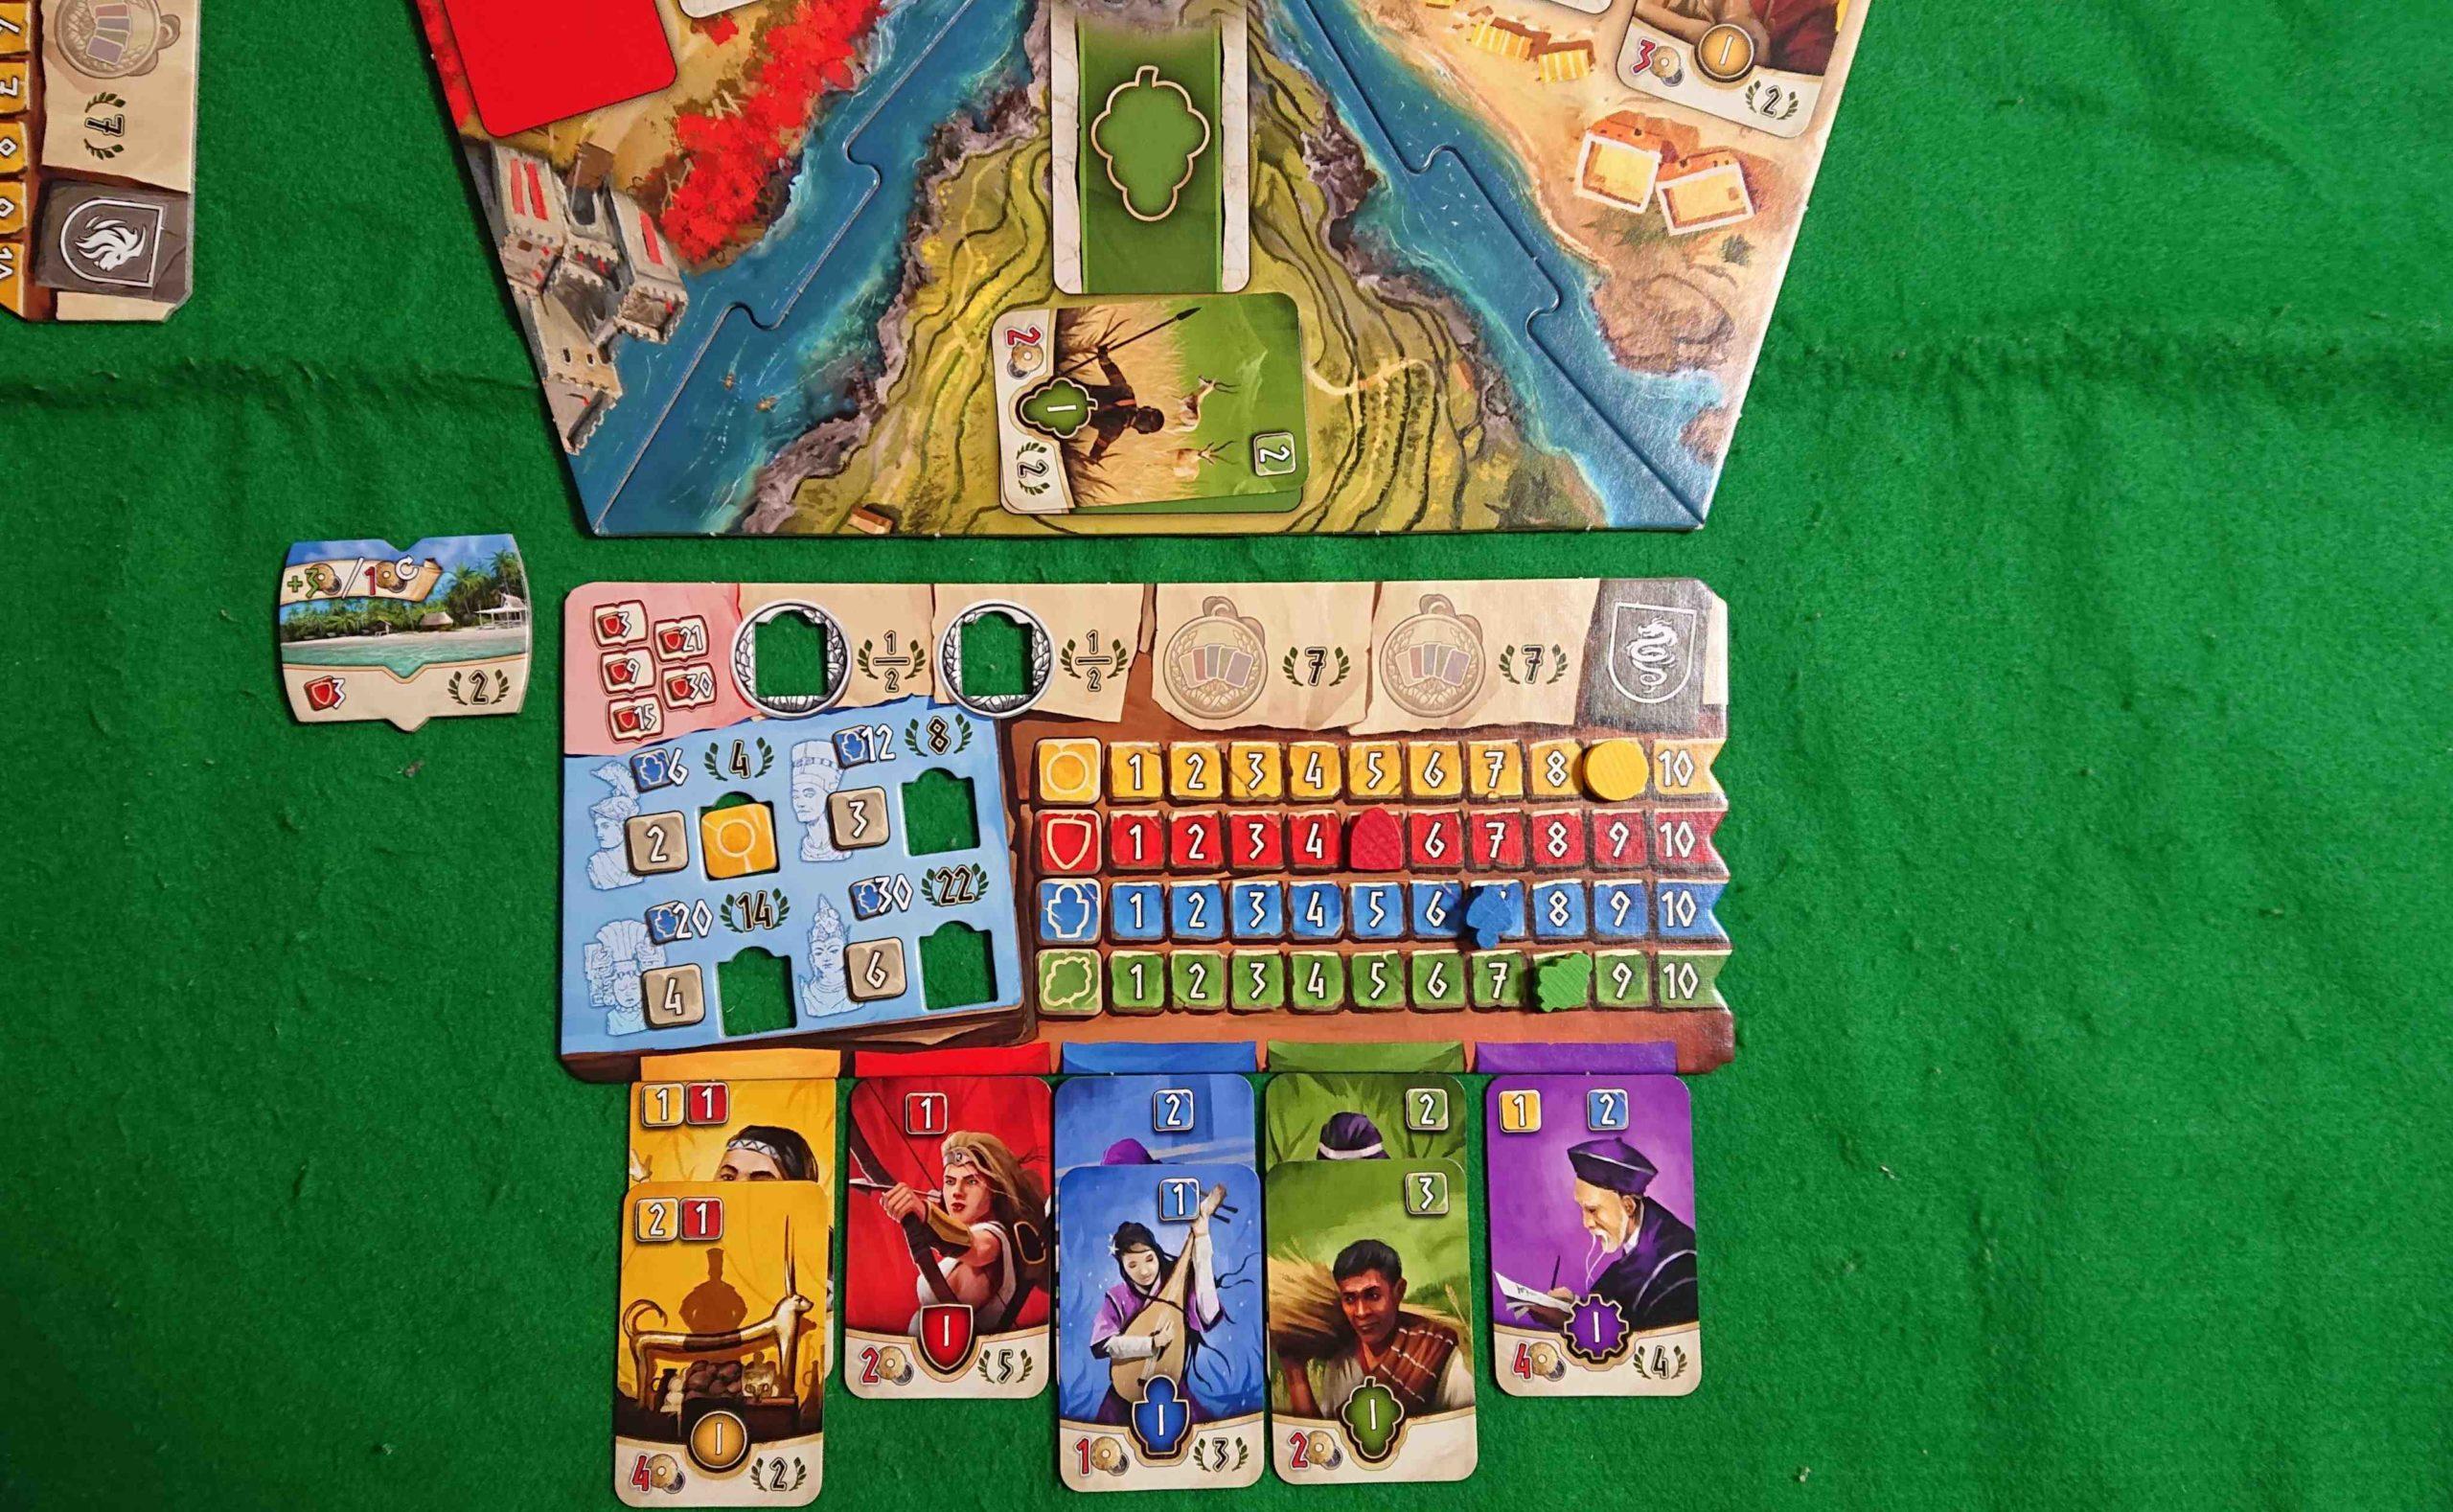 HADARA(ハダラ) ルール&レビュー 1枚のカードを購入するか売却するだけ! 4つの国力を発展させよ!  ボードゲーム